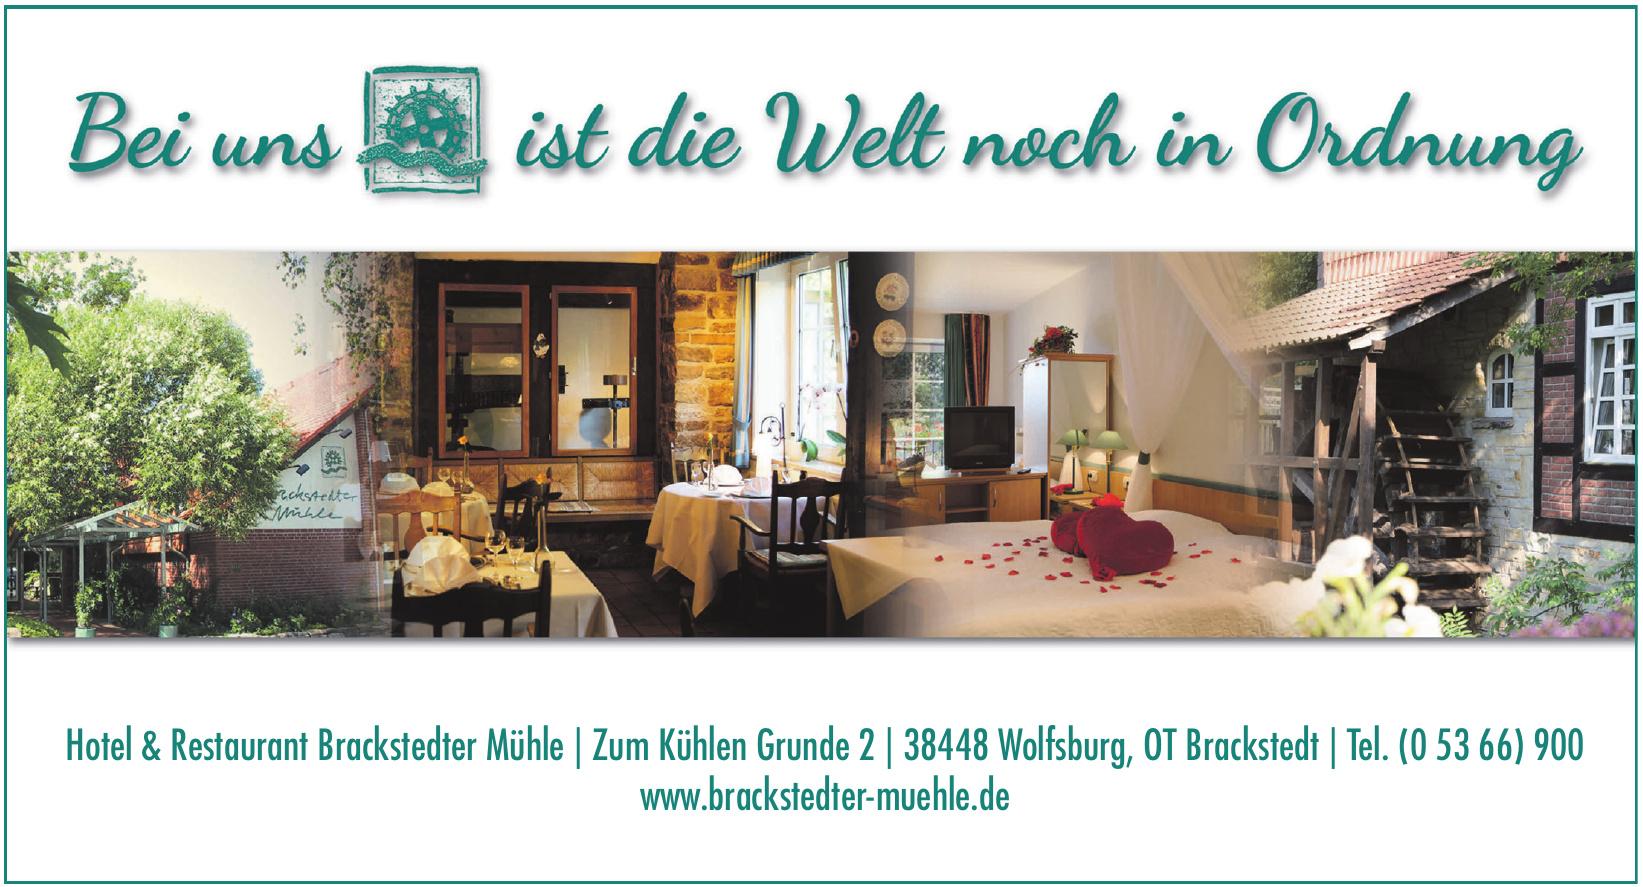 Hotel & Restaurant Brackstedter Mühle